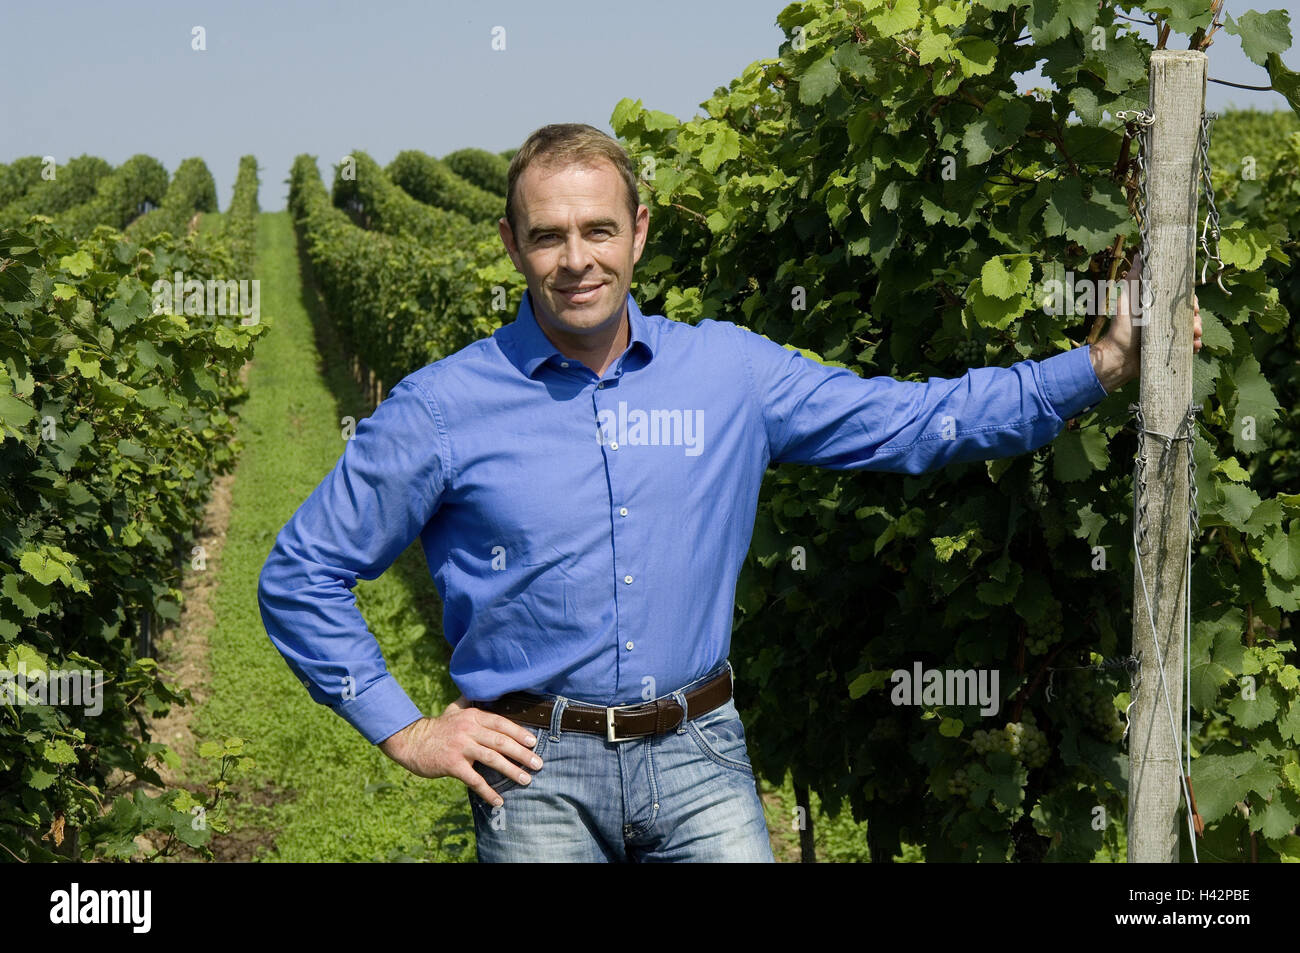 Vineyard, winegrower, satisfaction, person, man, viticulturist, vines, vines, grapes, wine, wine-growing, Önologie, - Stock Image